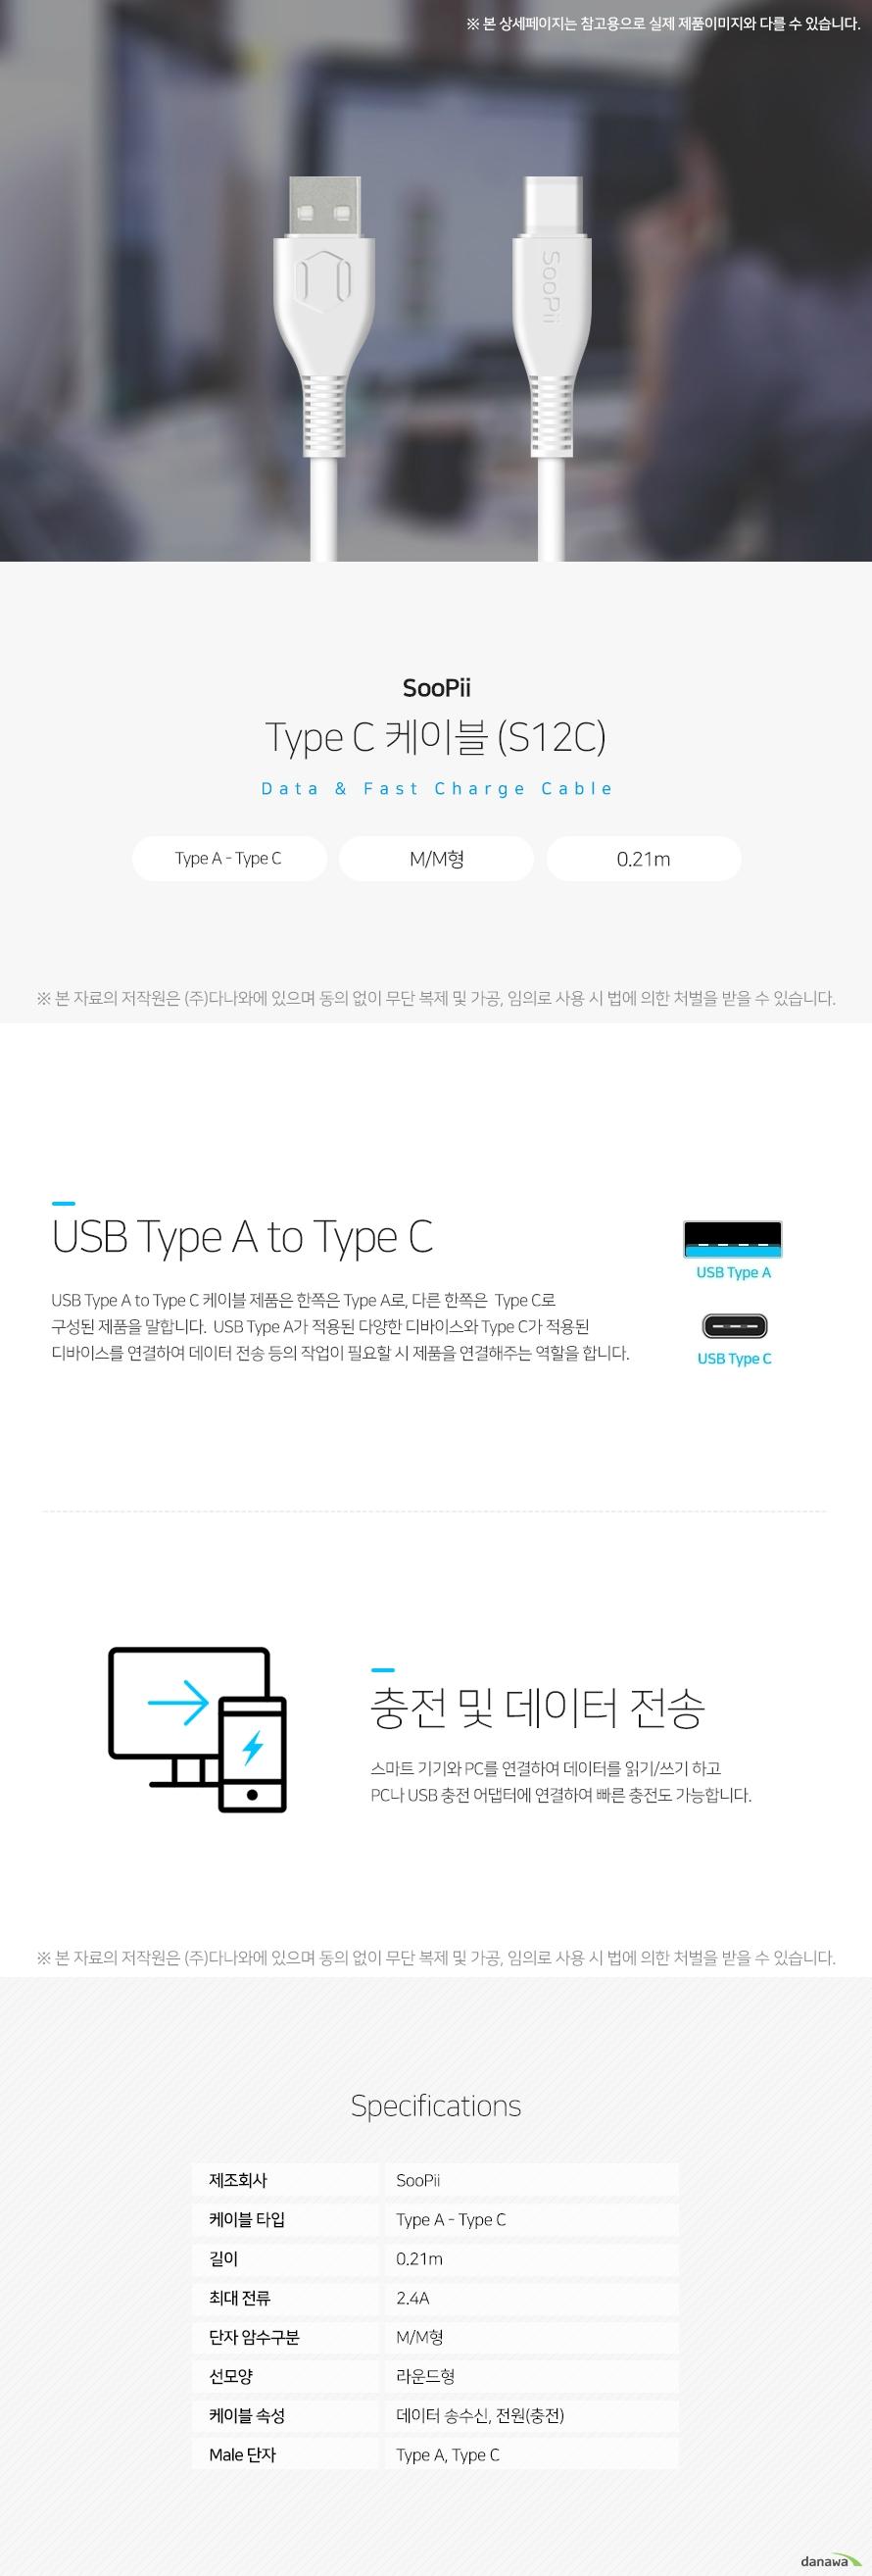 SooPii Type C 케이블 (S12C) USB Type A to Type C USB Type A to Type C 케이블 제품은 한쪽은 Type A로, 다른 한쪽은  Type C로 구성된 제품을 말합니다.  USB Type A가 적용된 다양한 디바이스와 Type C가 적용된 디바이스를 연결하여 데이터 전송 등의 작업이 필요할 시 제품을 연결해주는 역할을 합니다.  충전 및 데이터 전송 스마트 기기와 PC를 연결하여 데이터를 읽기/쓰기 하고 PC나 USB 충전 어댑터에 연결하여 빠른 충전도 가능합니다. 스펙 제조회사 SooPii 케이블 타입 Type A - Type C 길이 0.21m 최대 전류 2.4A 단자 암수구분 M/M형 선모양 라운드형 케이블 속성 데이터송수신, 전원(충전) Male 단자 Type A, Type C